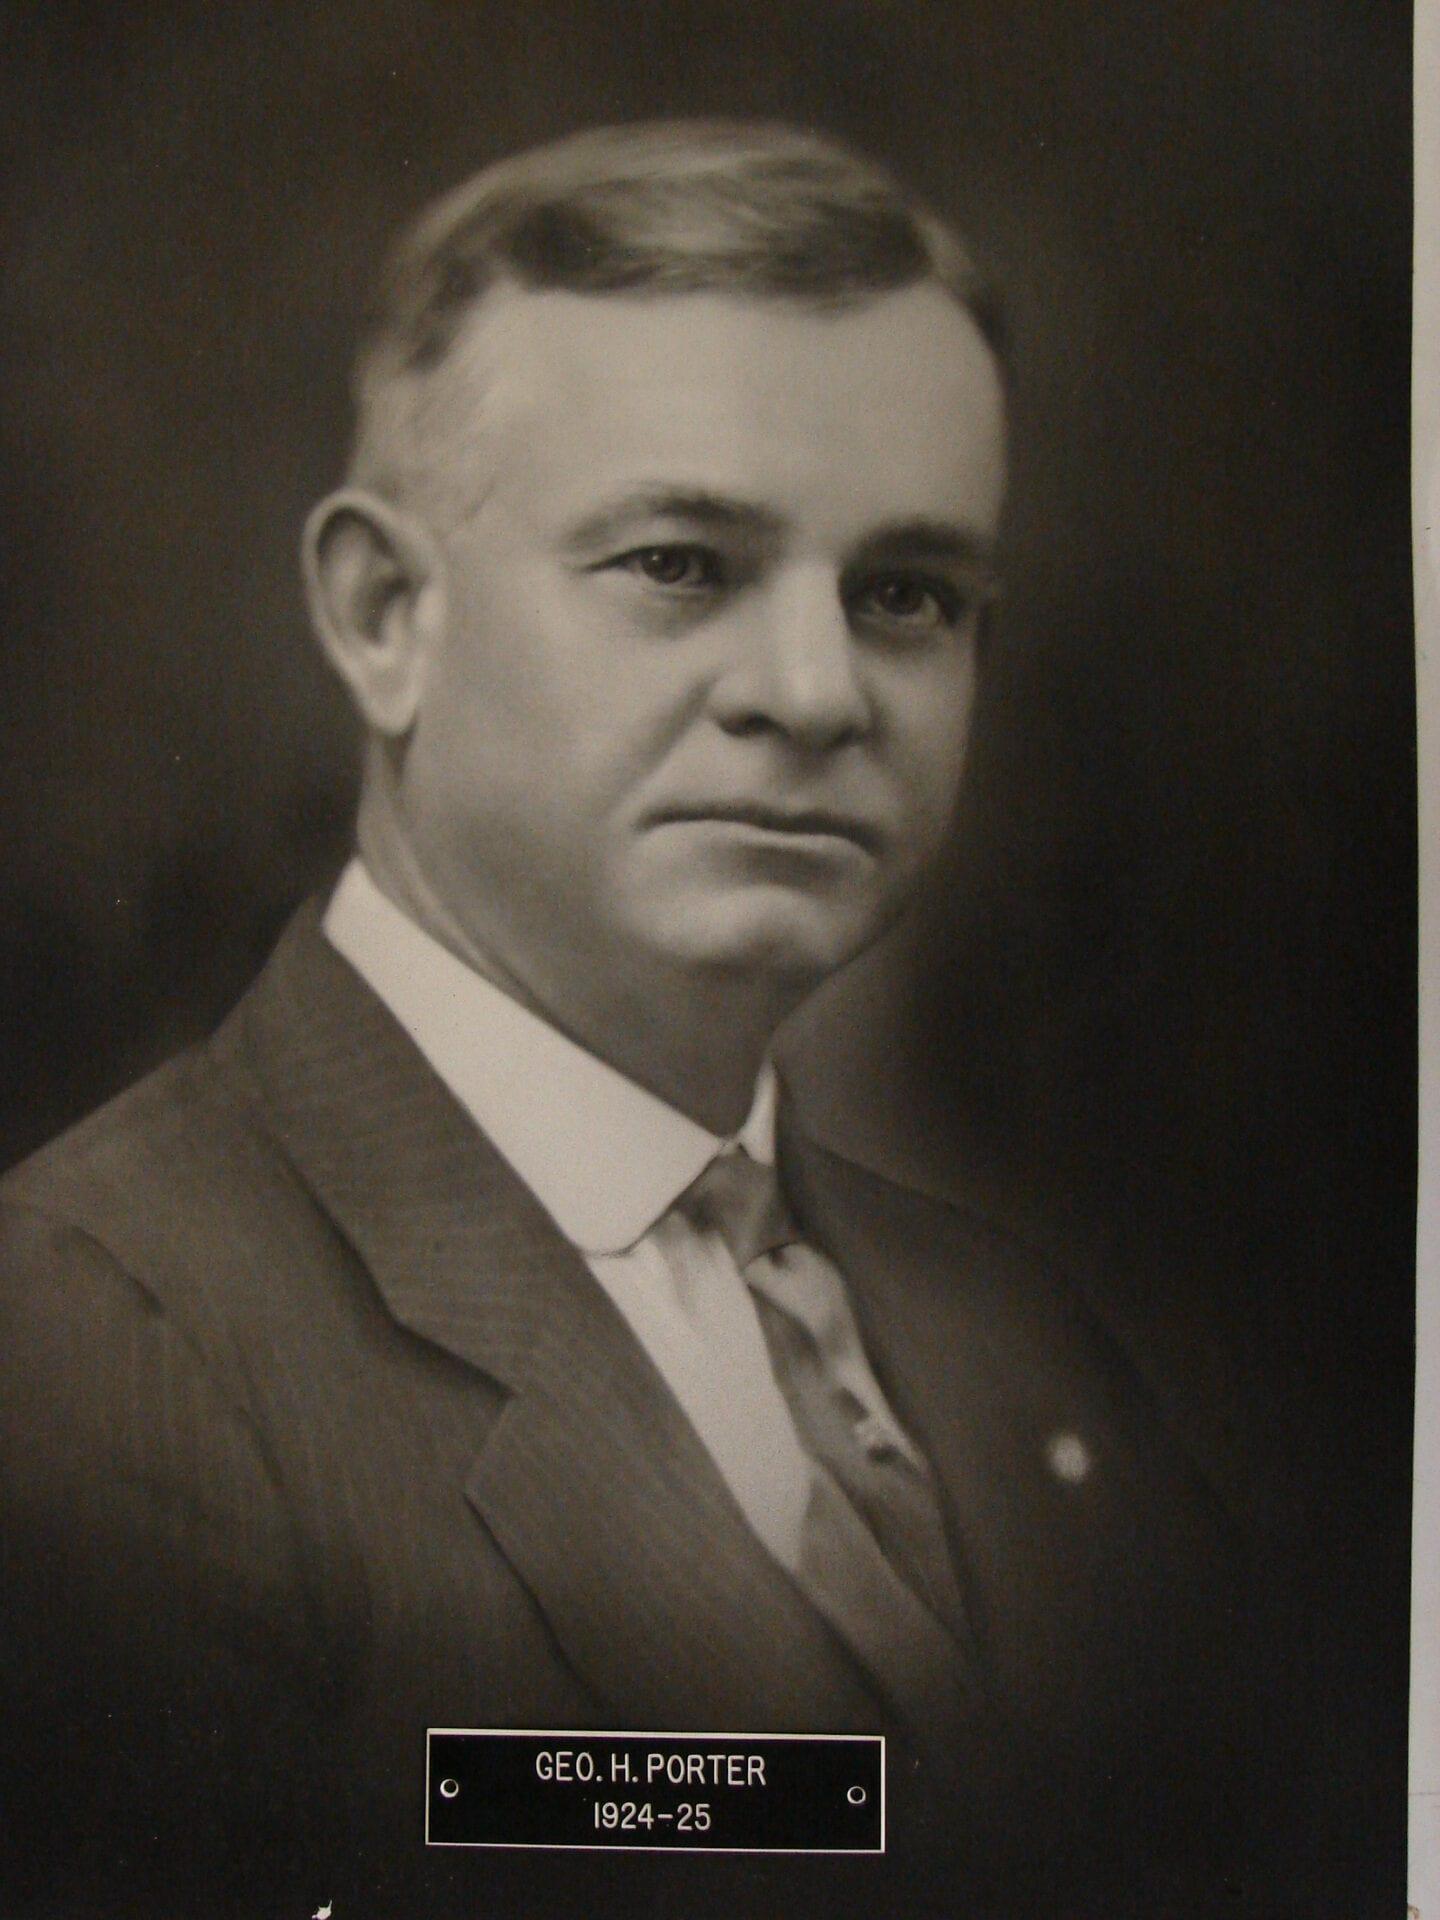 George H Porter